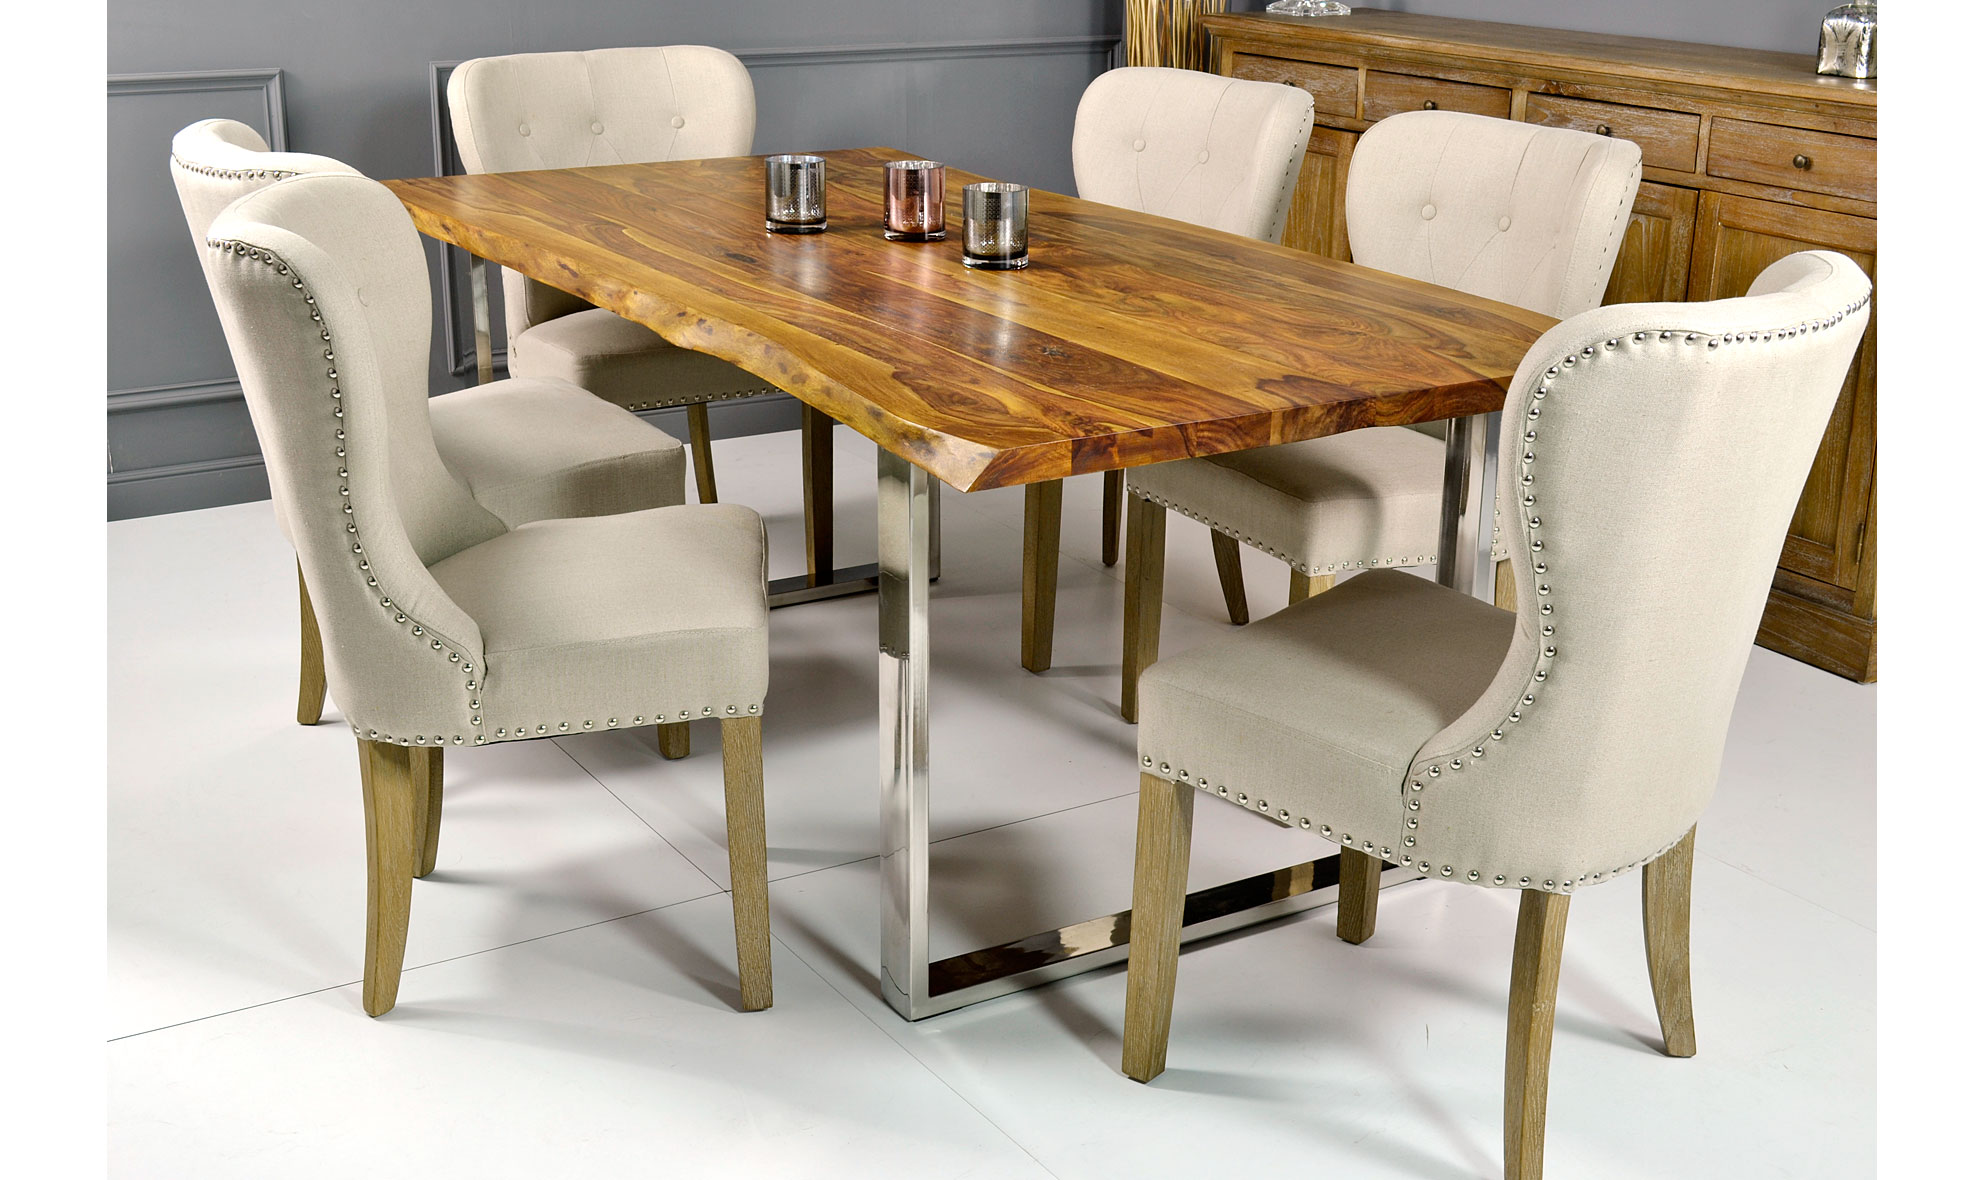 Mesas troncos17 revista muebles mobiliario de dise o for Mesas de troncos de madera